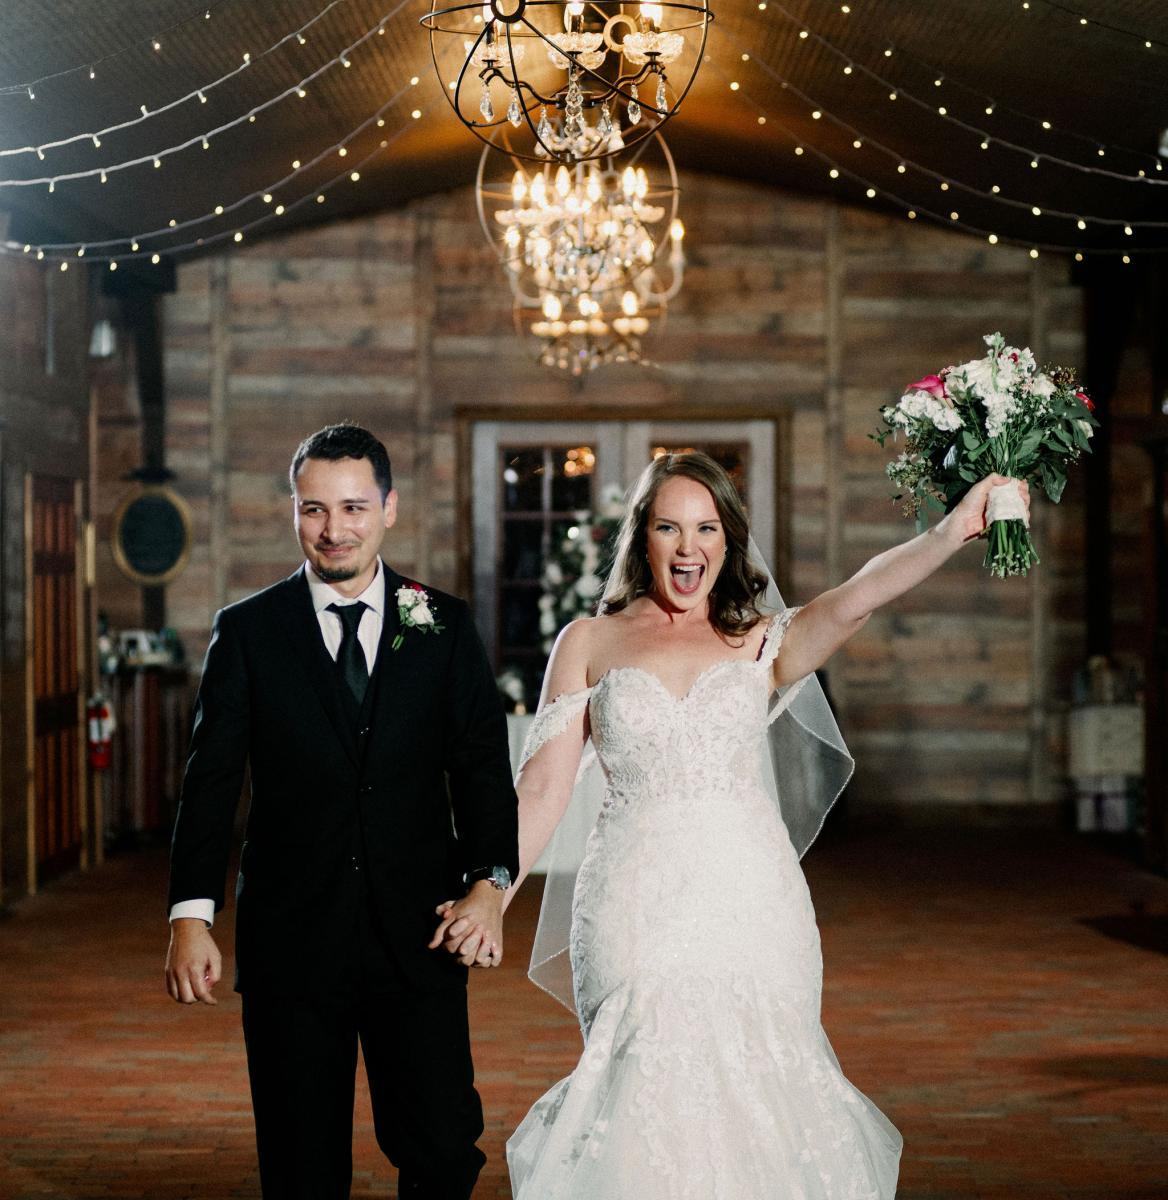 Wedding reception introduction